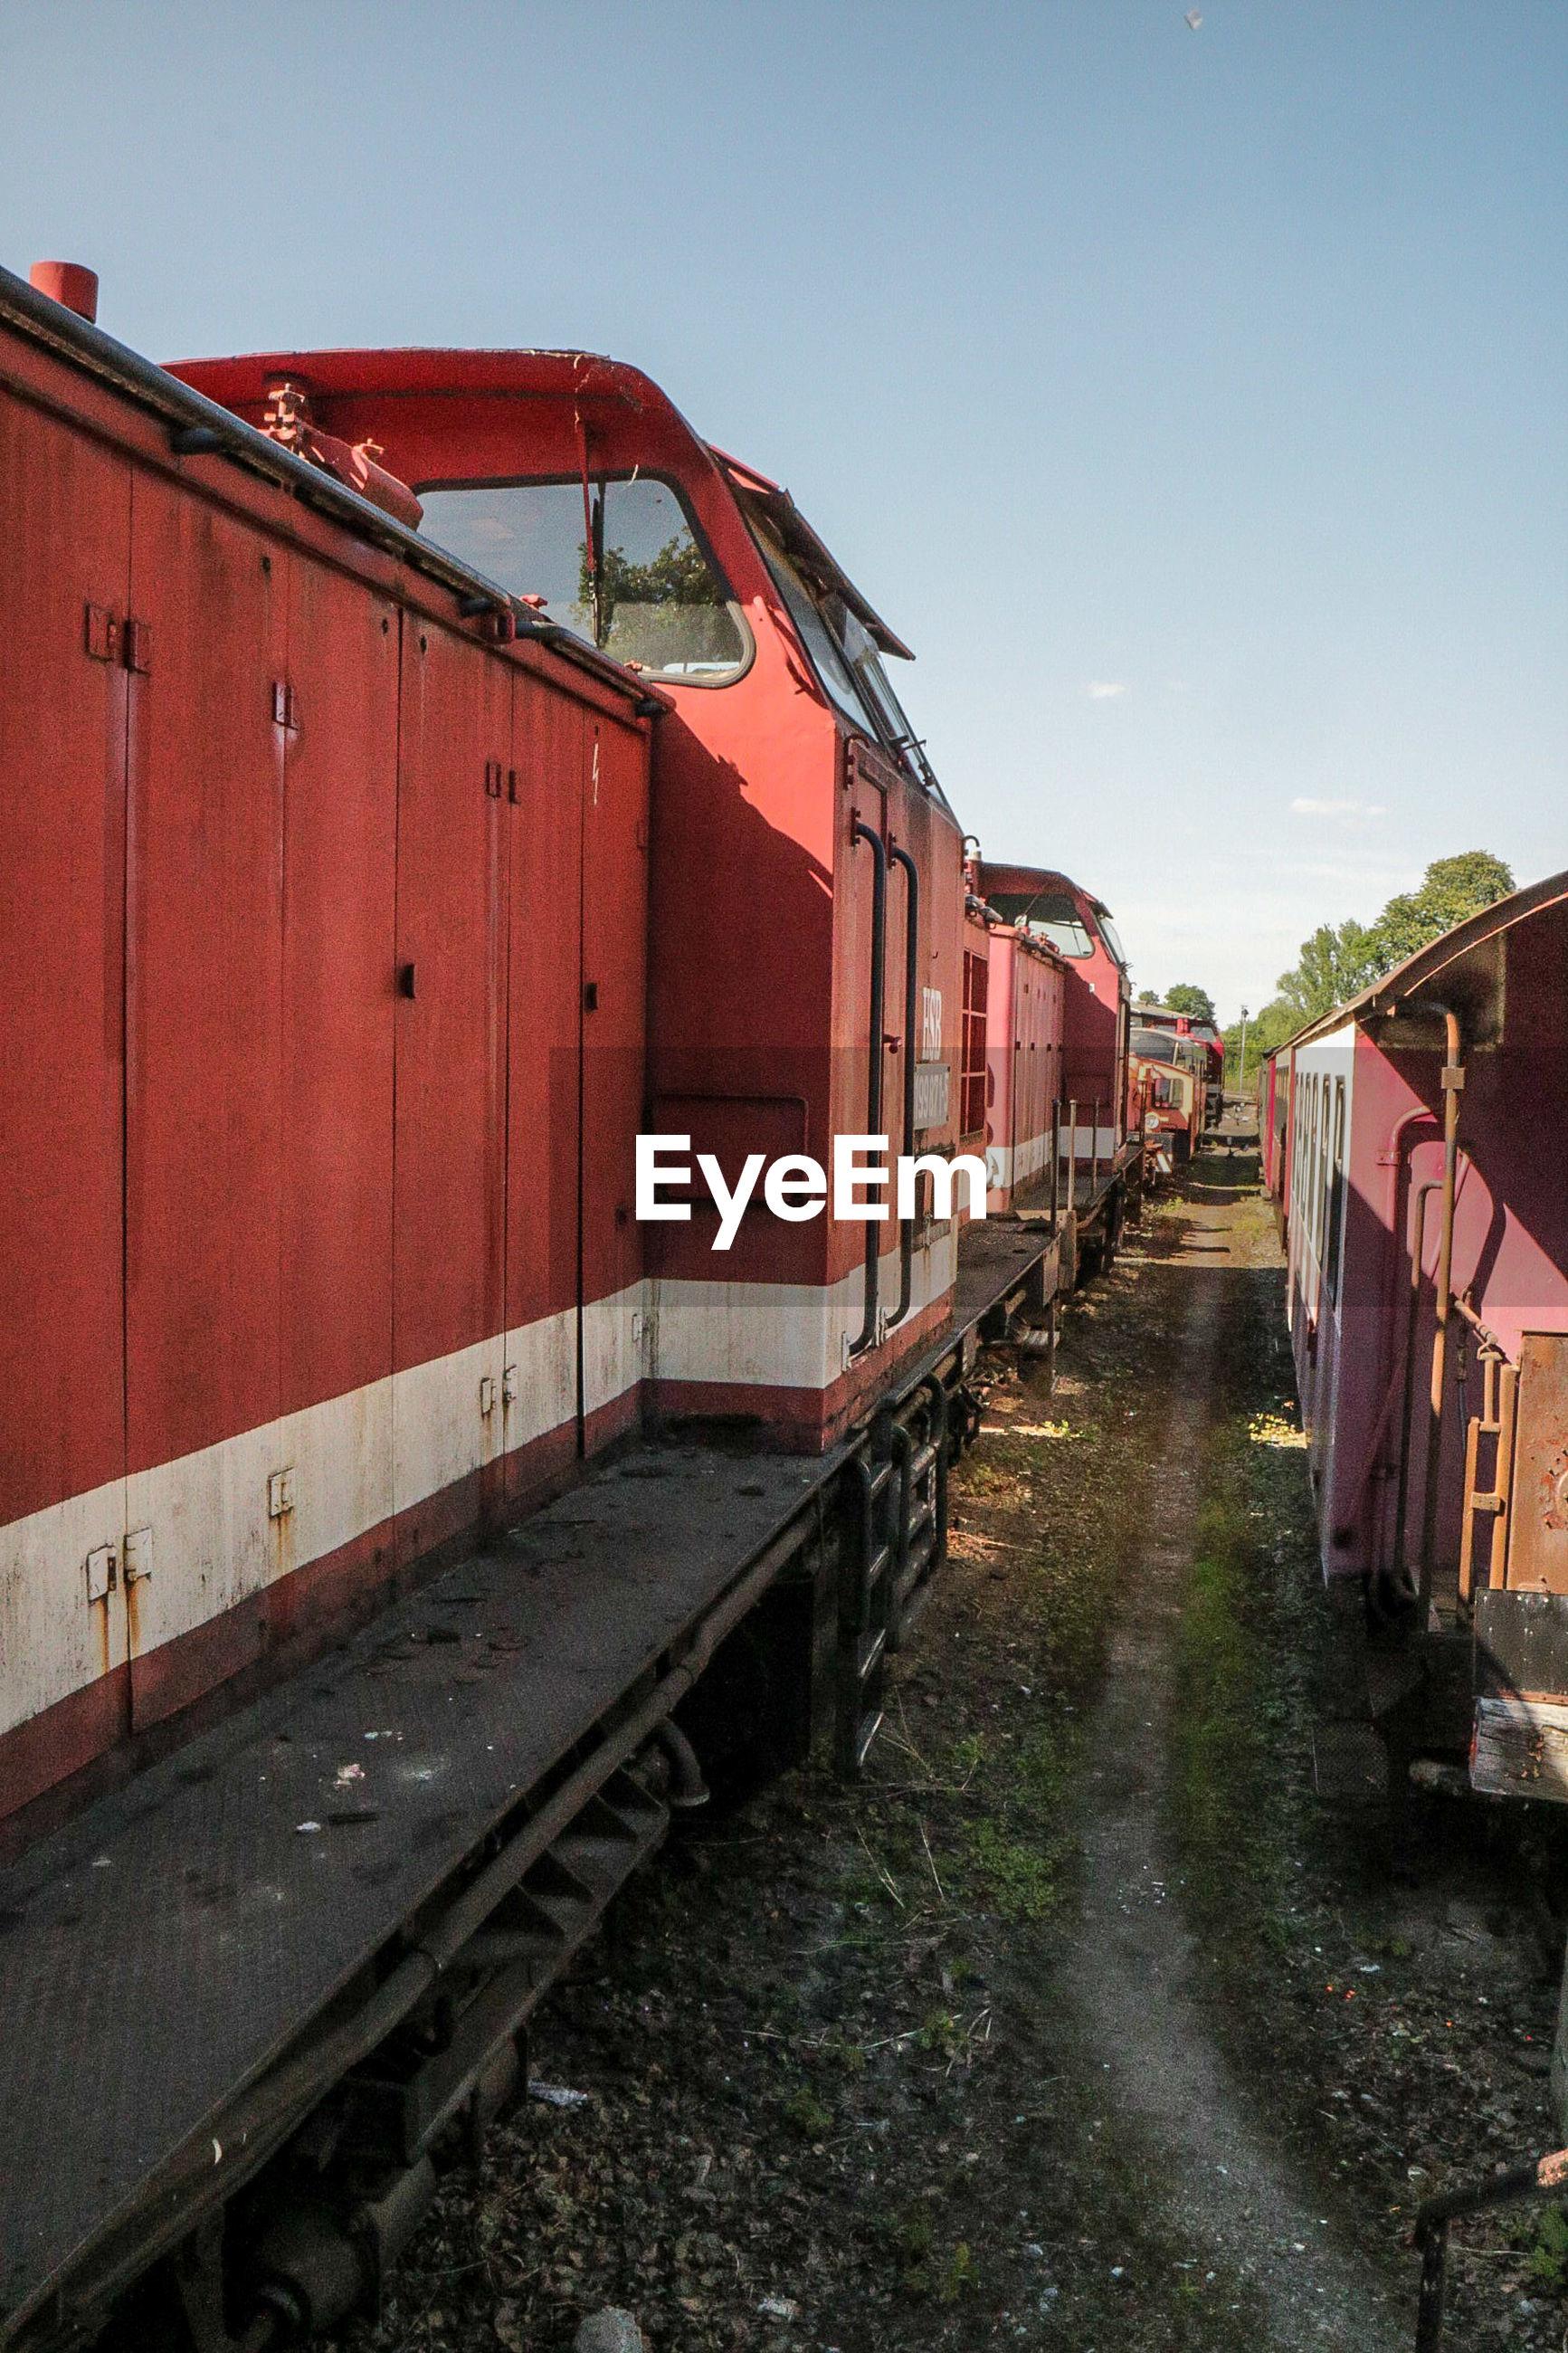 Trains against sky